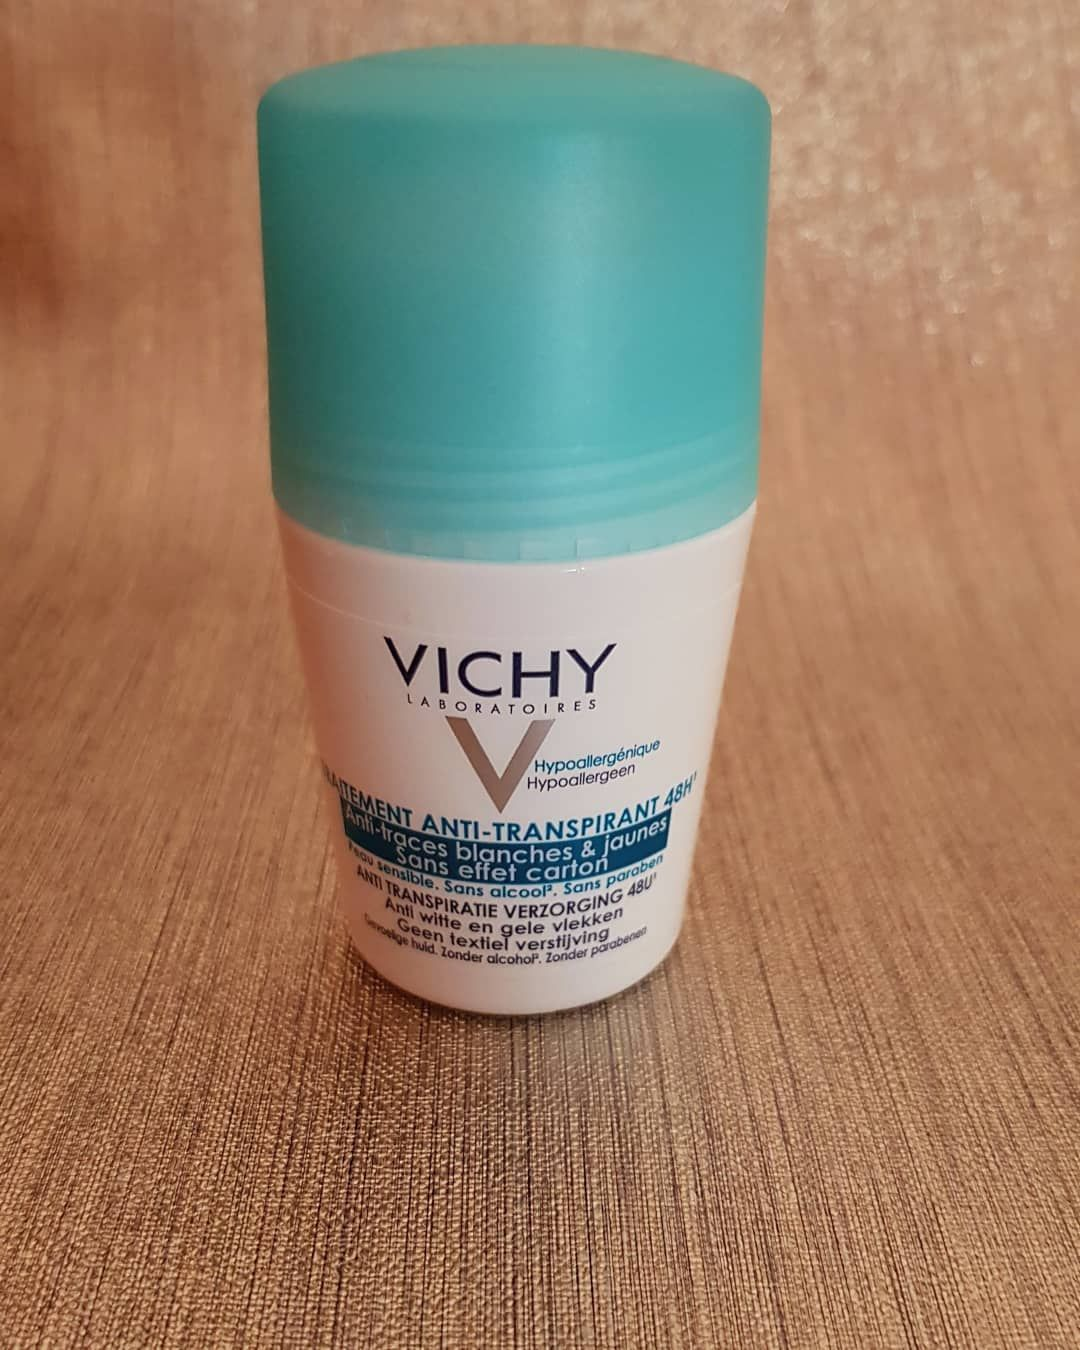 This Is A Must Have The Best Deodorant I Have Tried So Far البنات كنصحكم بهاد مزيل العرق من عند Vichymaroc احسن واحد جربتو Skin Care Instagram Beauty